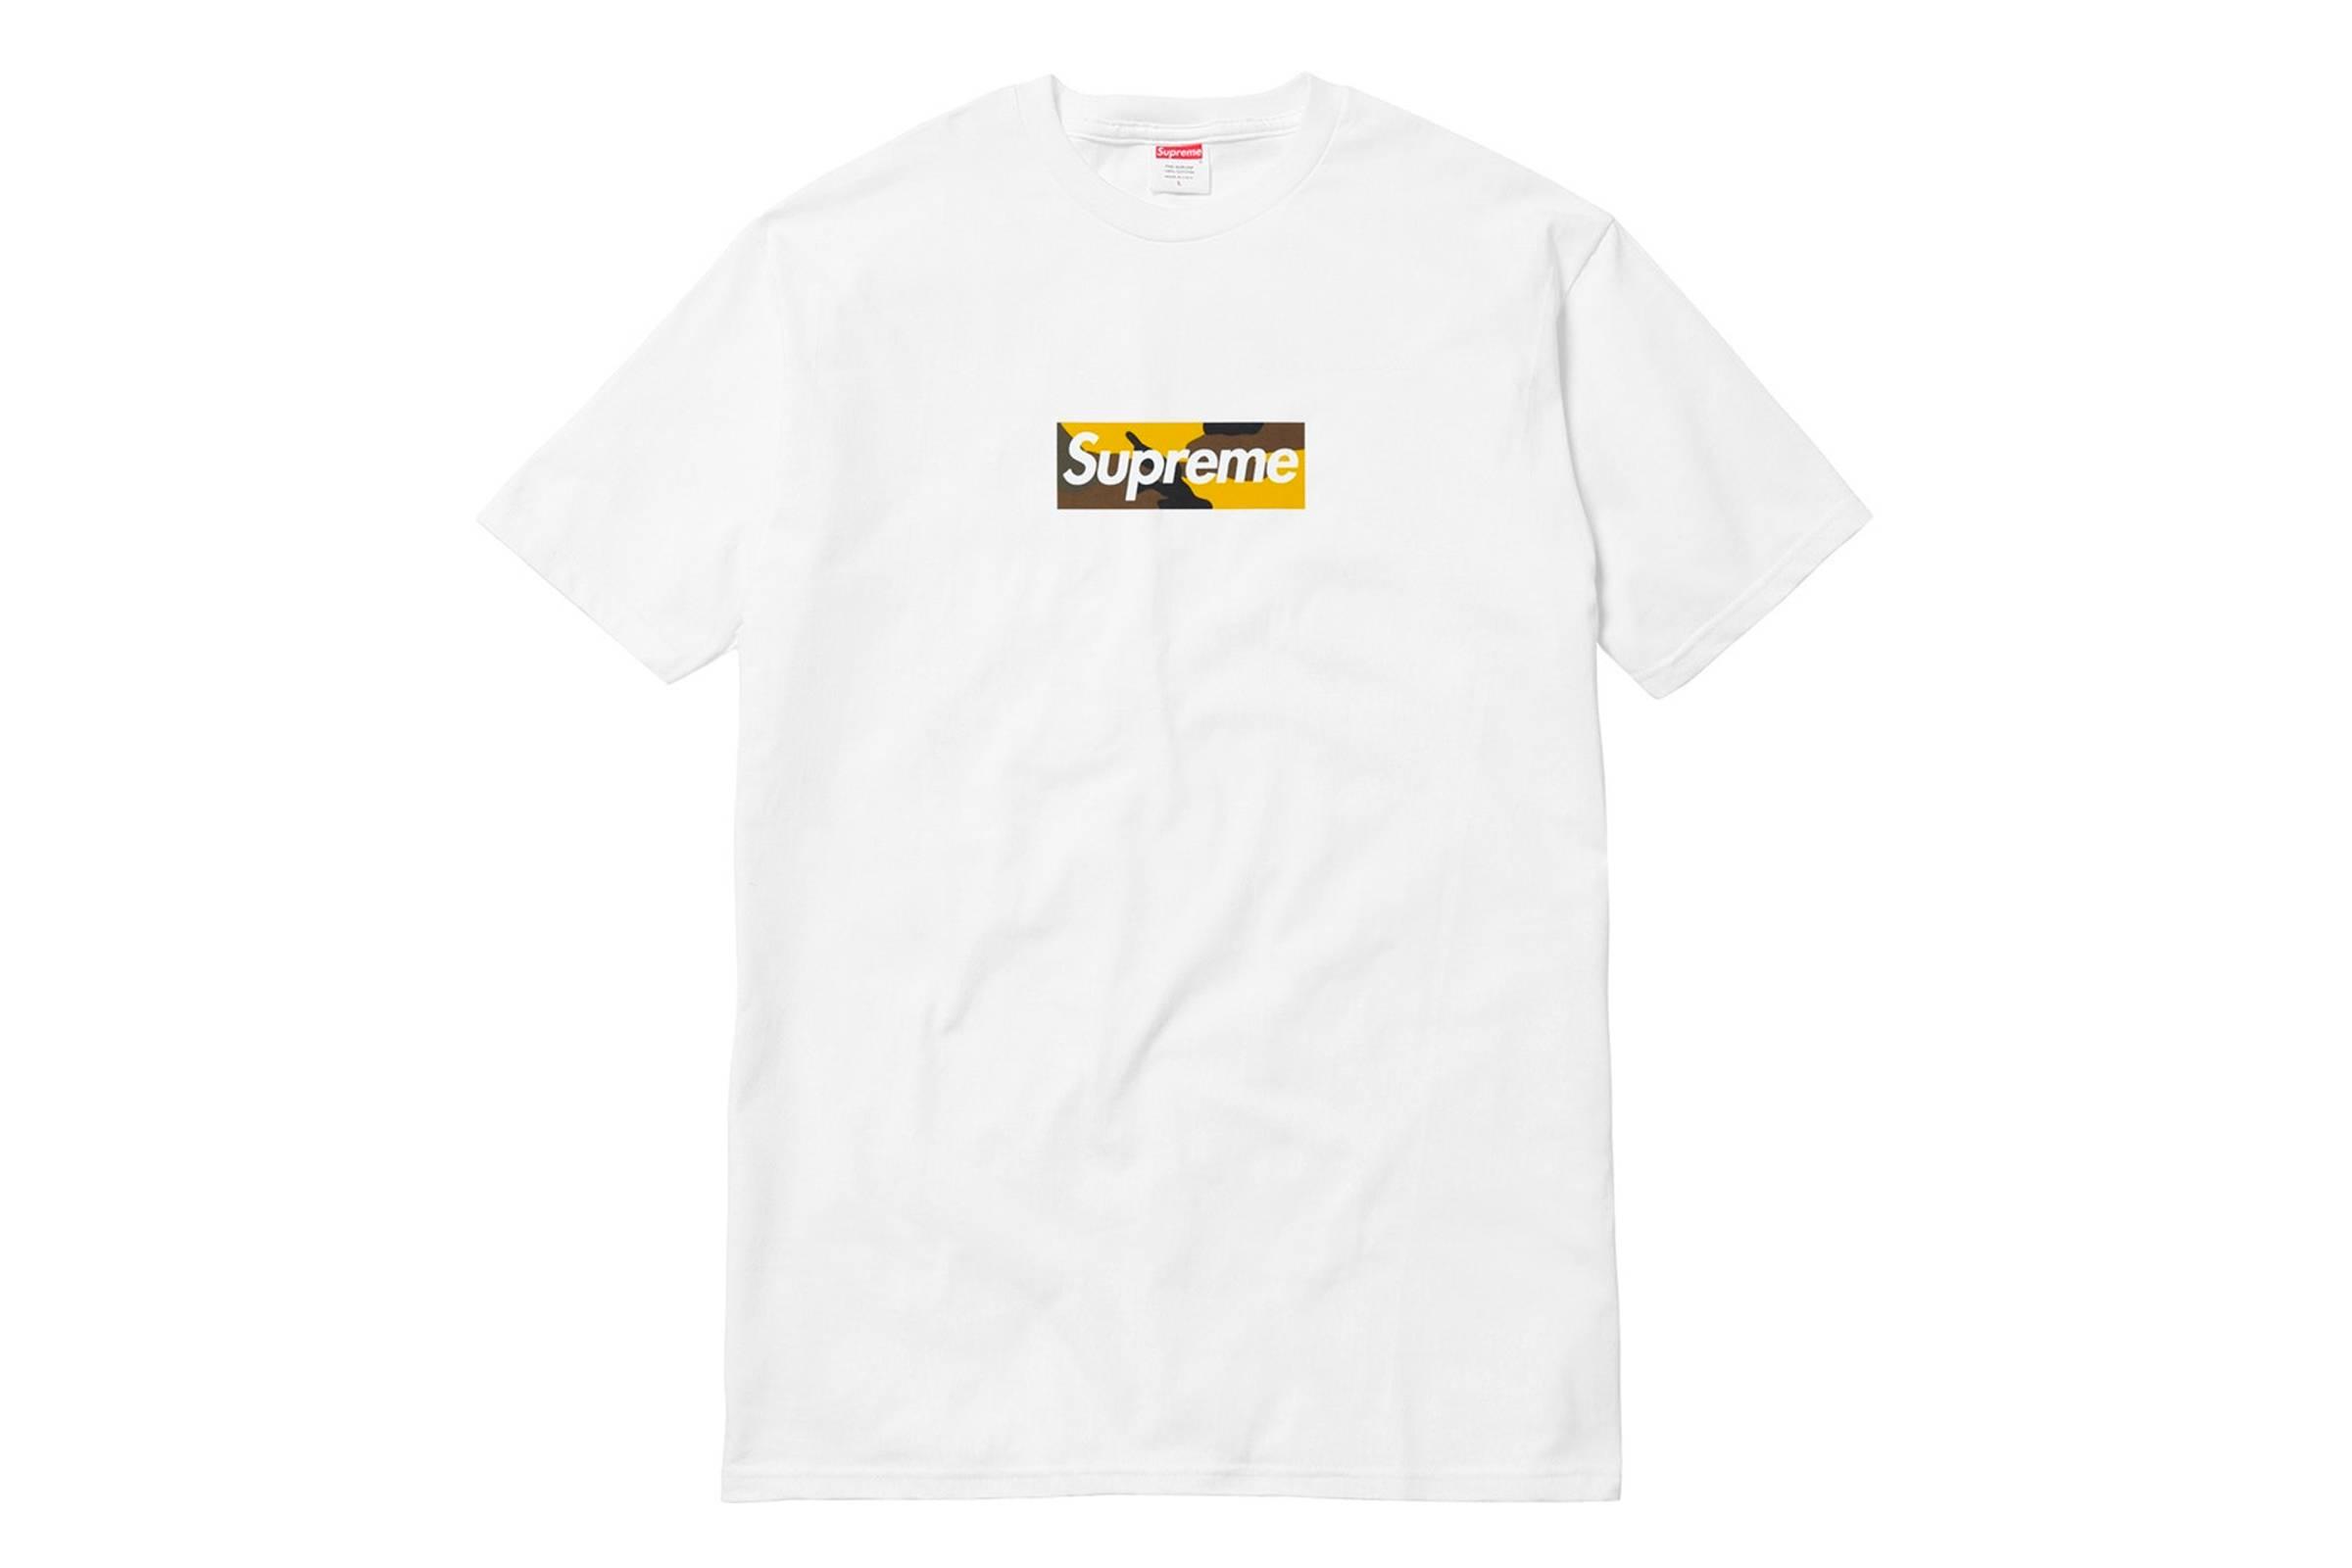 5. Supreme Brooklyn Box Logo T-Shirt